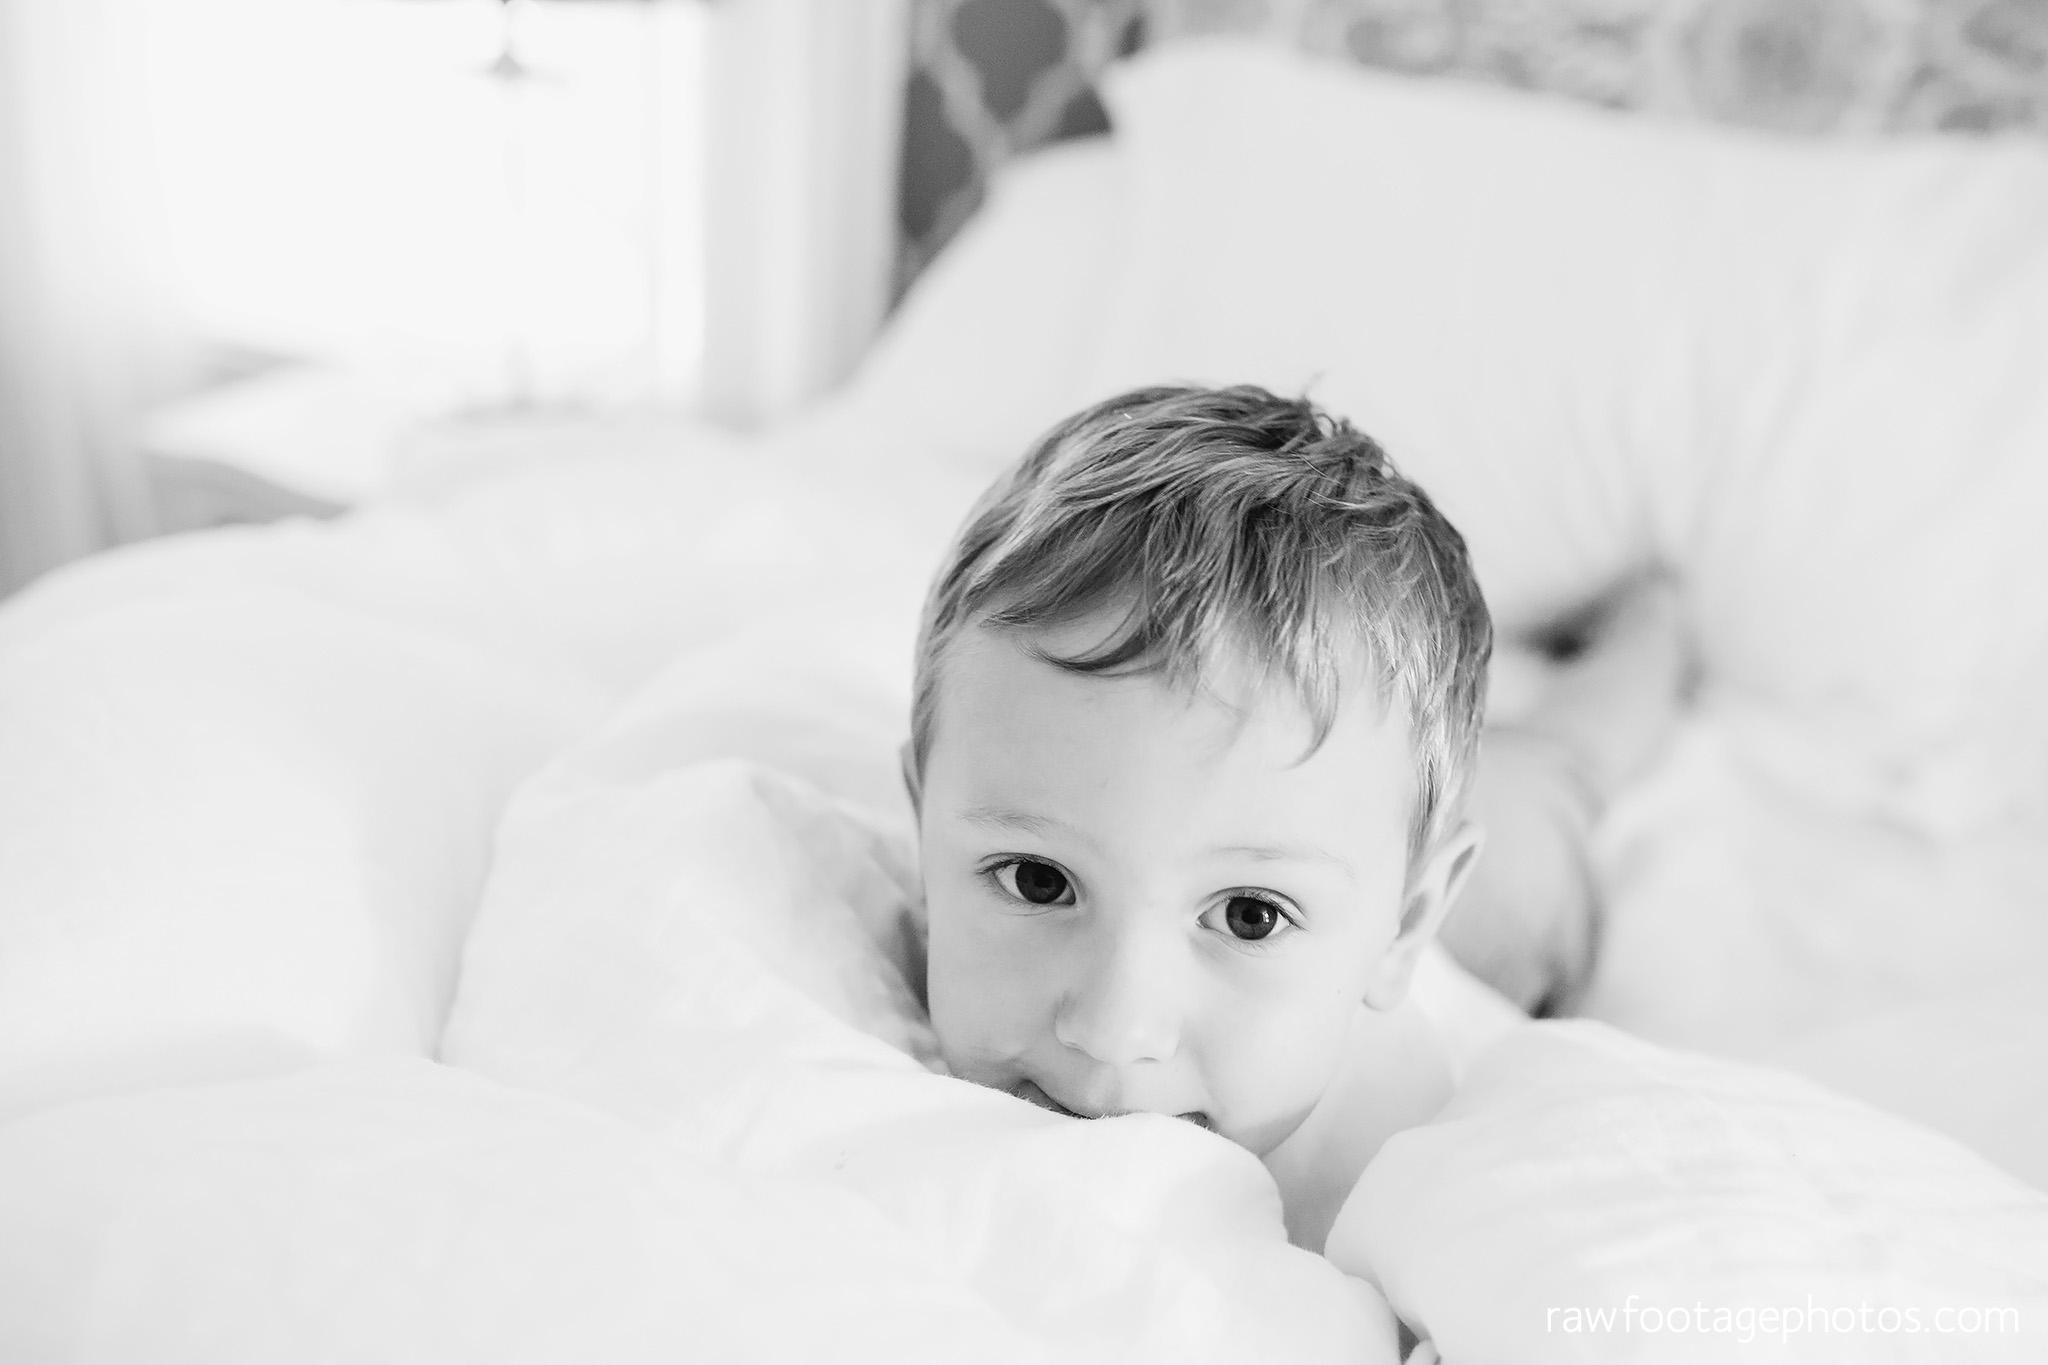 london_ontario_newborn_lifestyle_photographer-best_of_2018-raw_footage_photography059.jpg